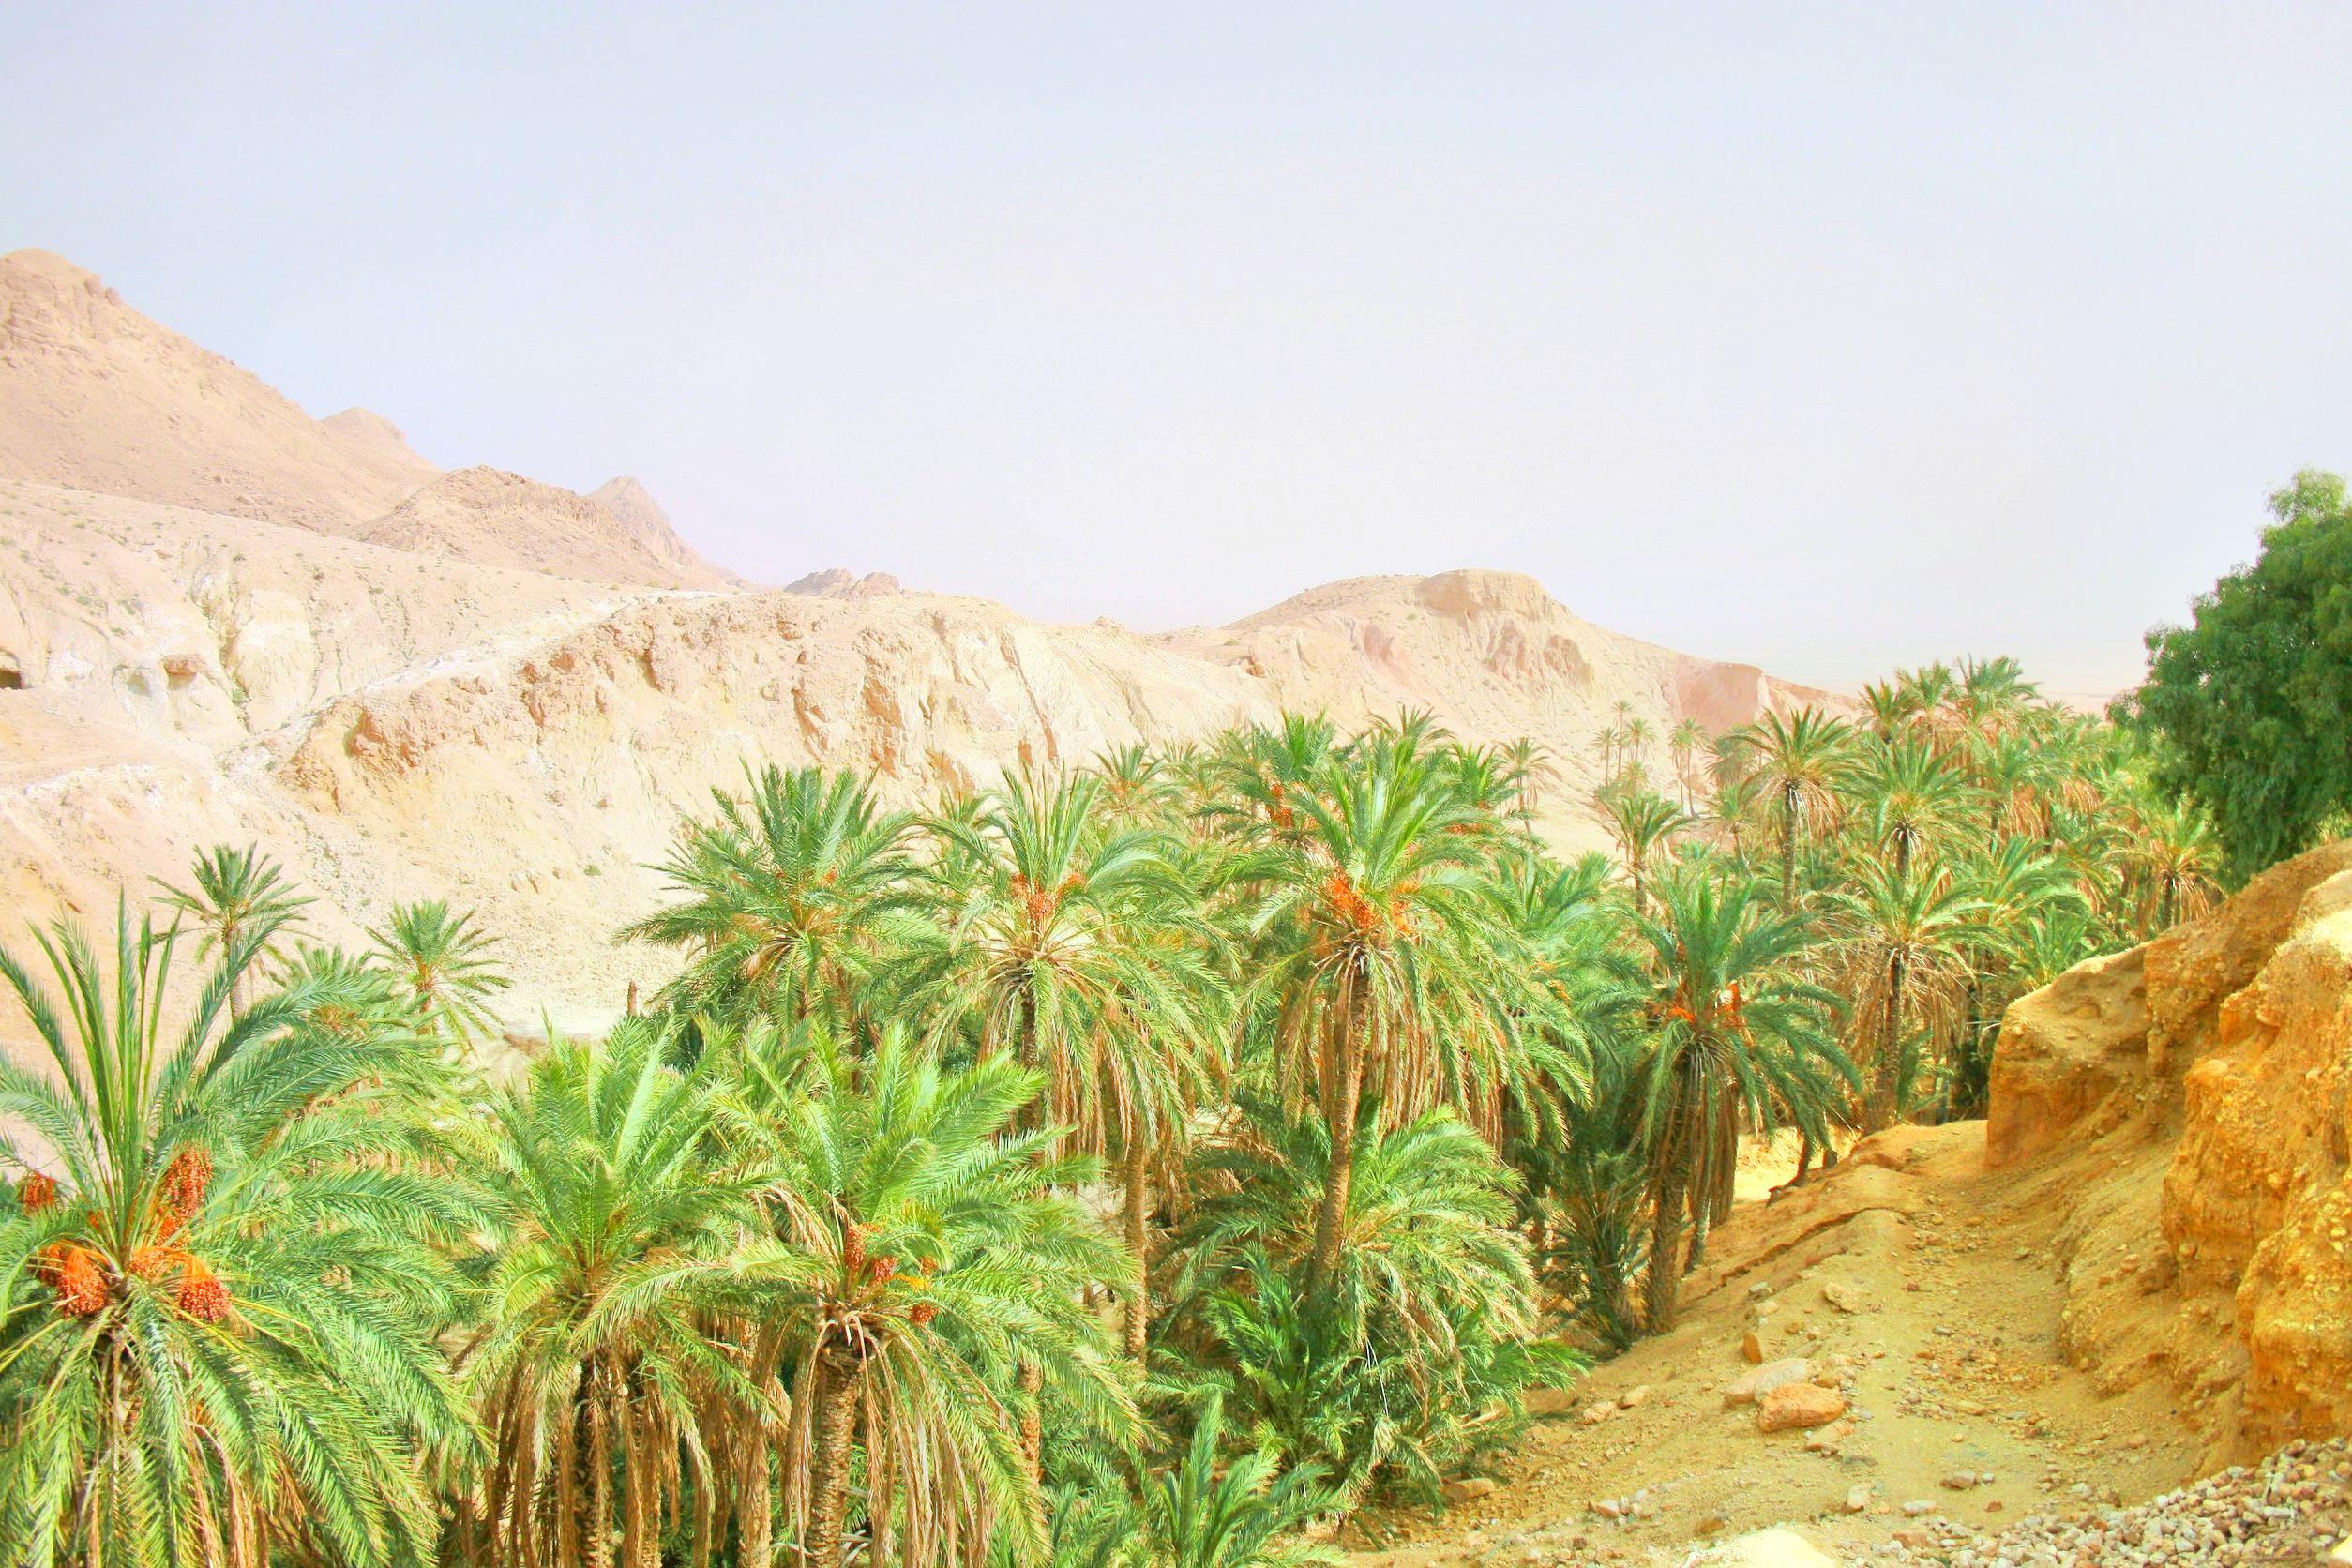 Chebika Oasis